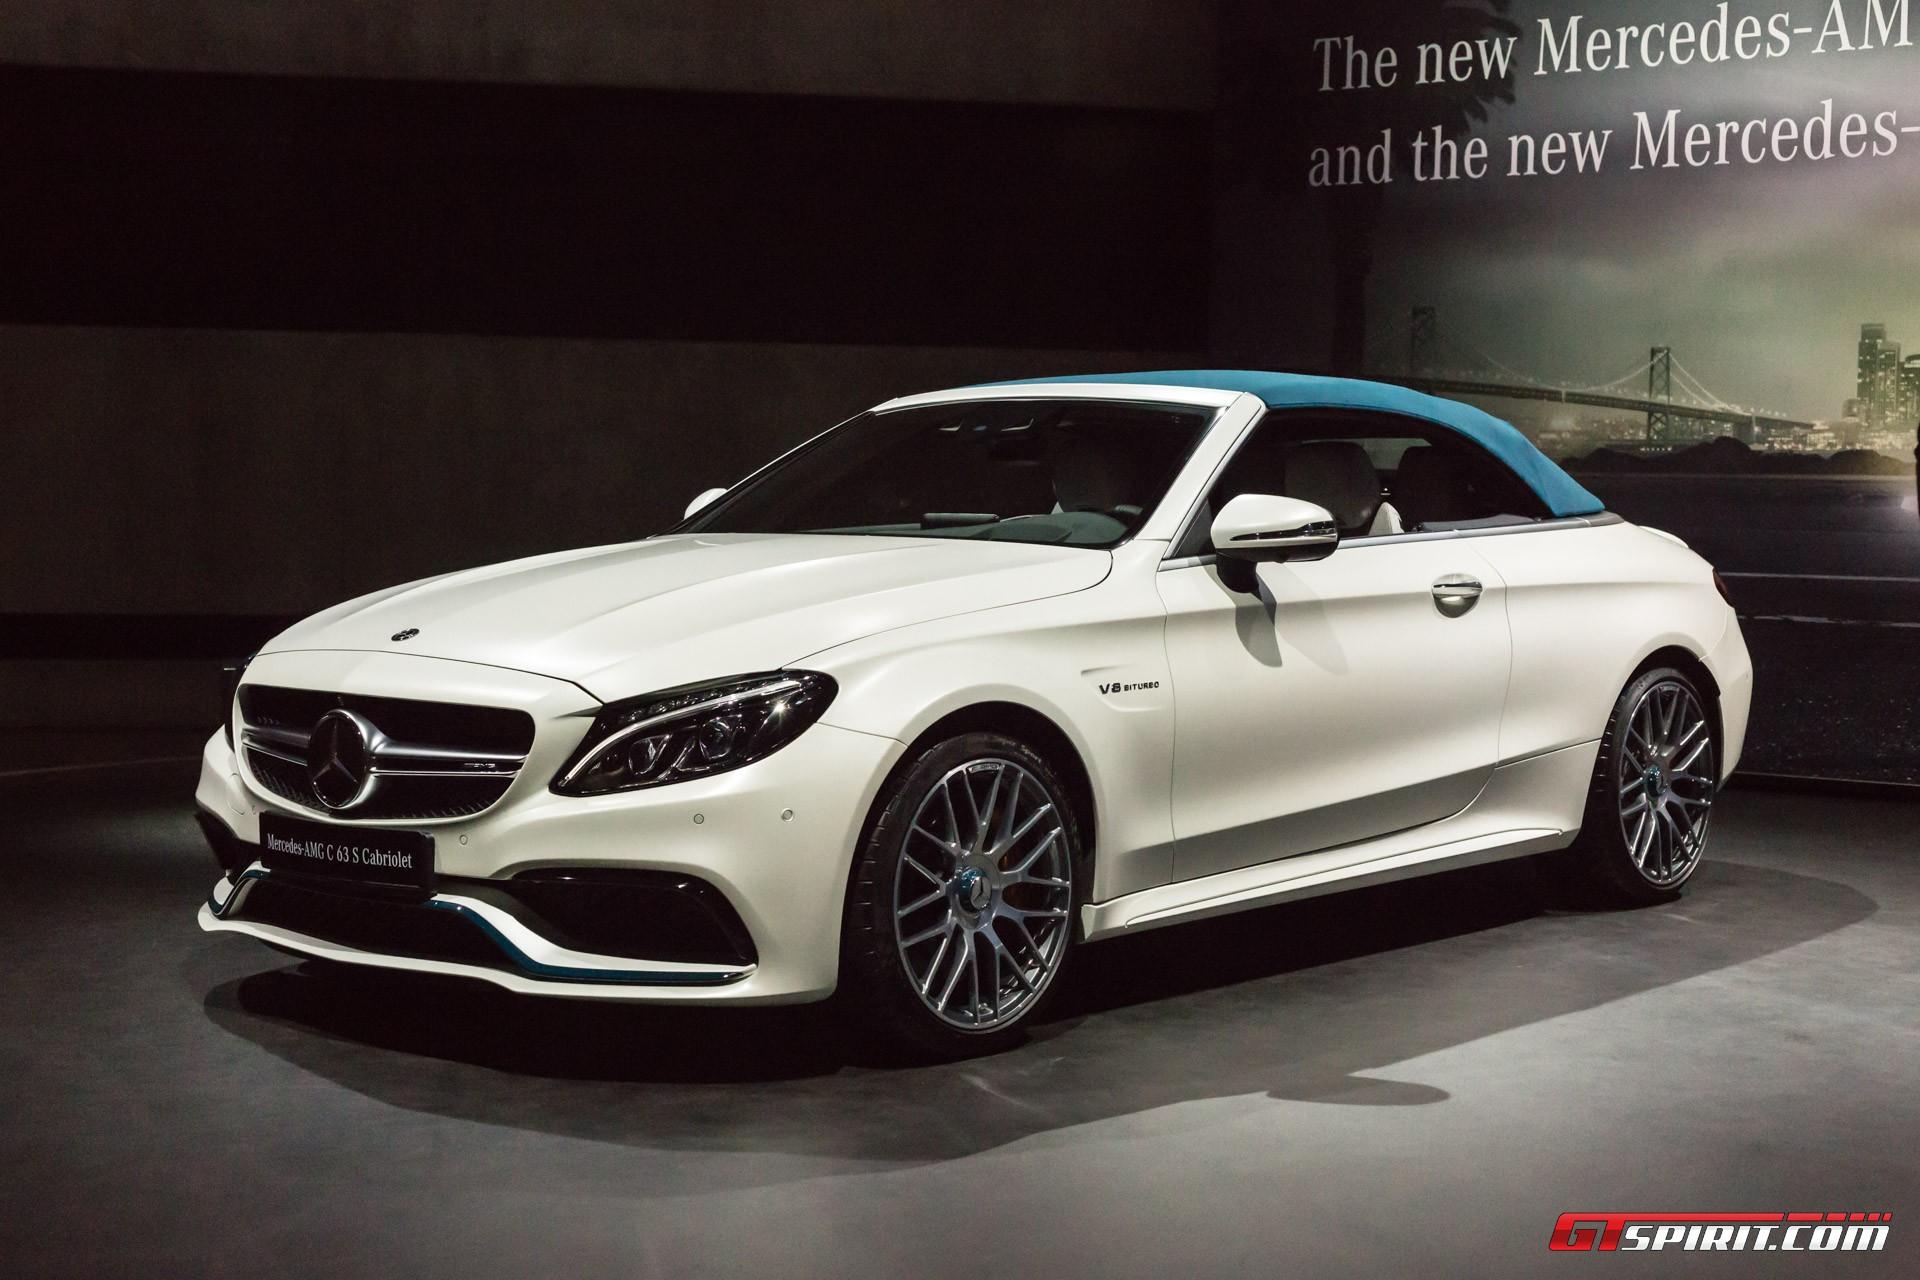 https://storage.googleapis.com/gtspirit/uploads/2017/03/Mercedes_Benz_AMG_C_63_S_Ocean_Blue_Edition_Geneva17-1-1.jpg